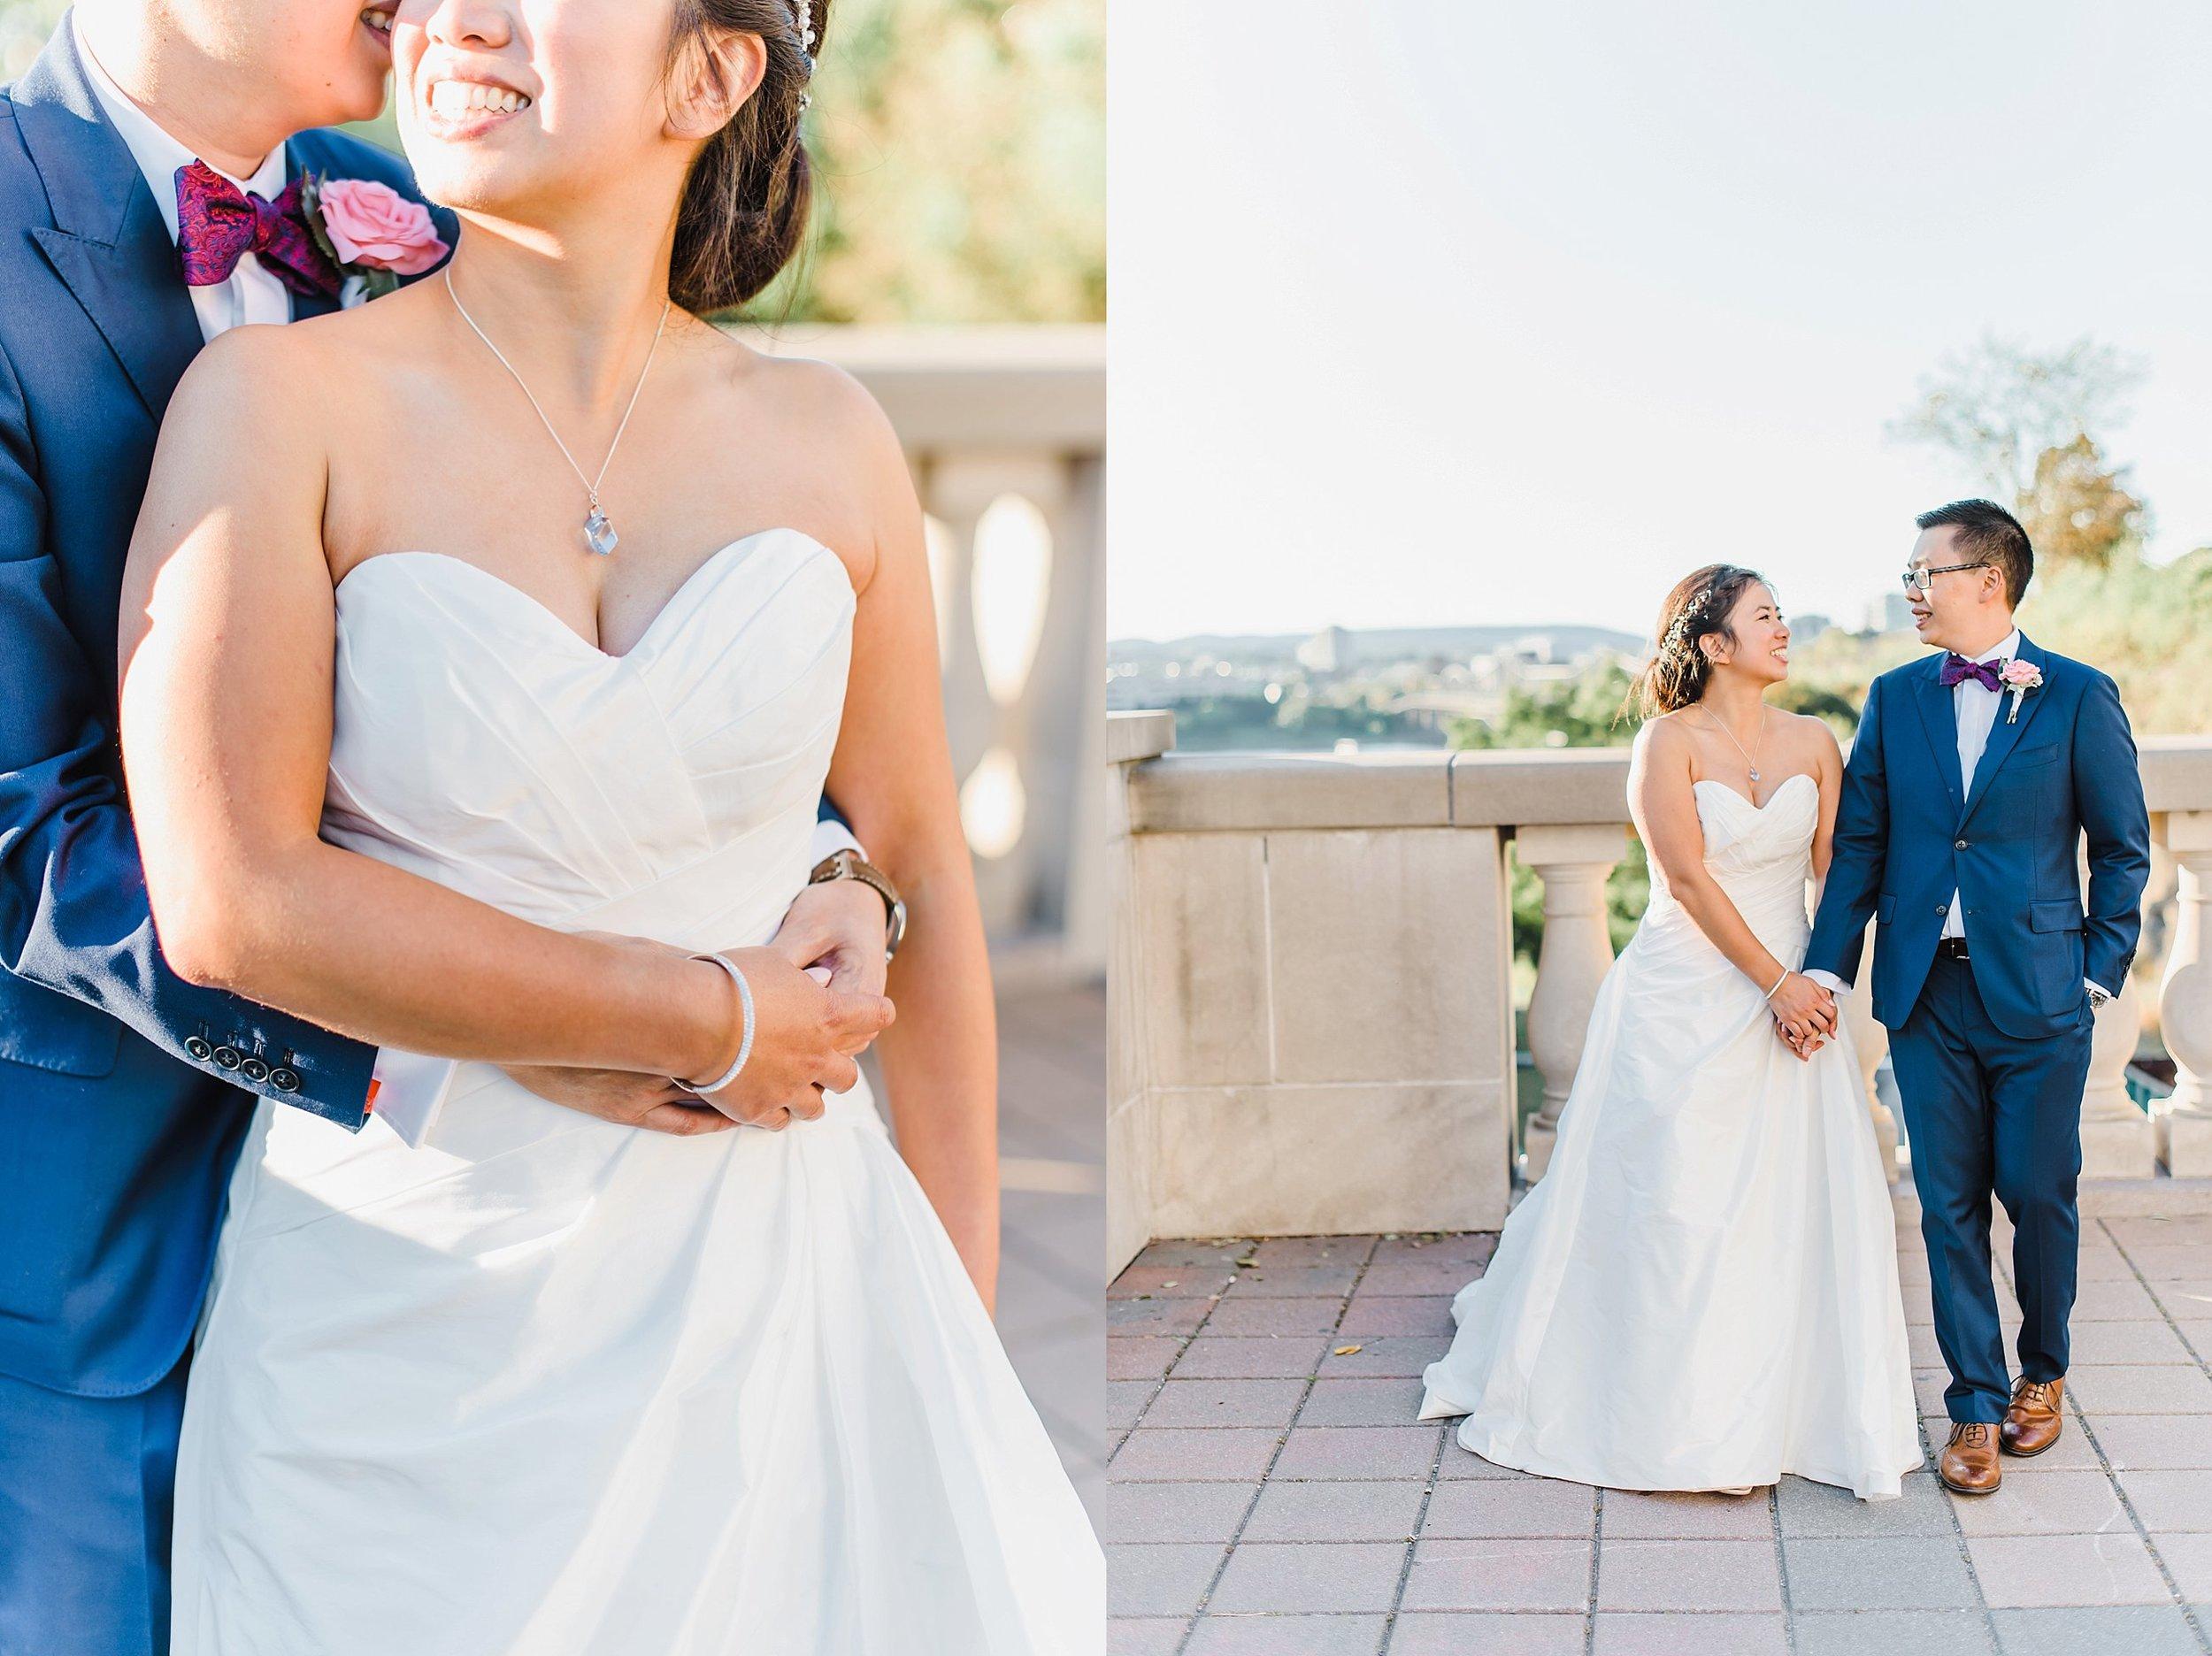 light airy indie fine art ottawa wedding photographer | Ali and Batoul Photography_1555.jpg